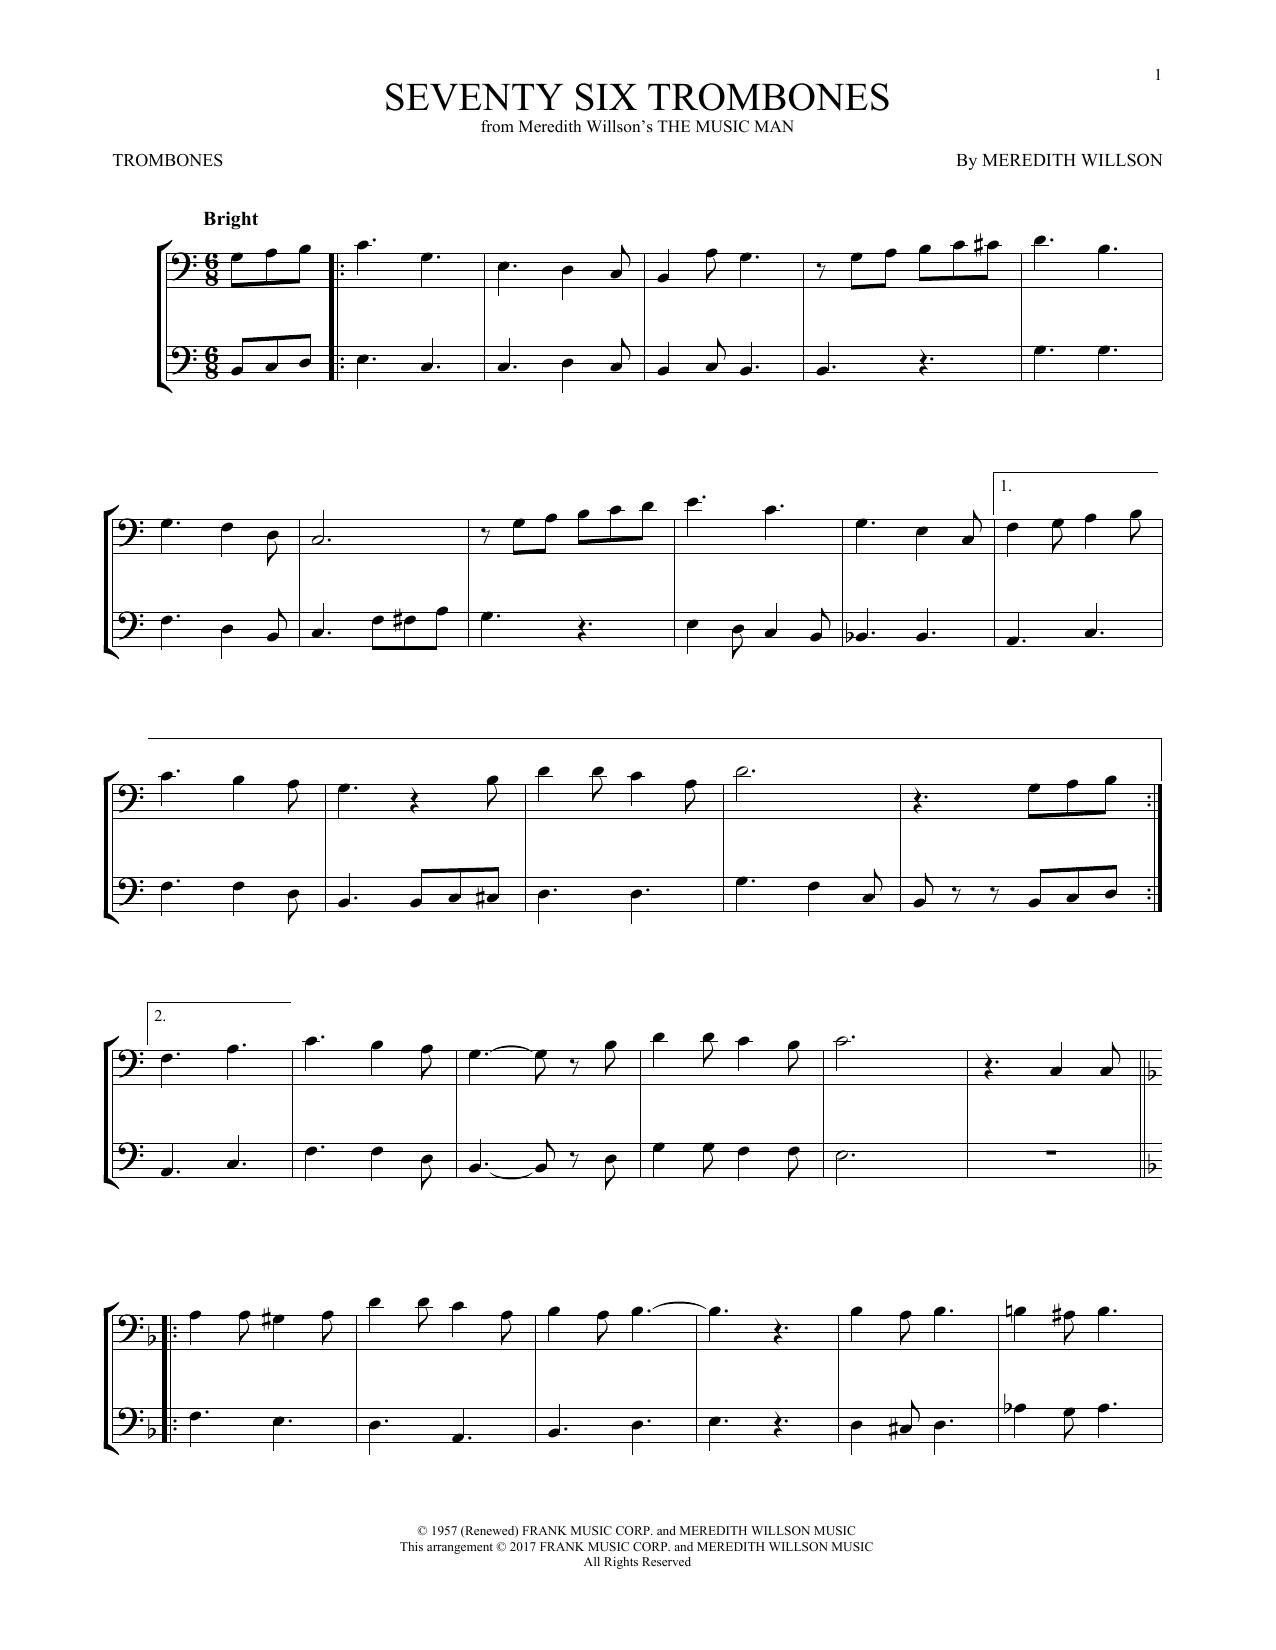 Seventy Six Trombones (from The Music Man) (Trombone Duet)